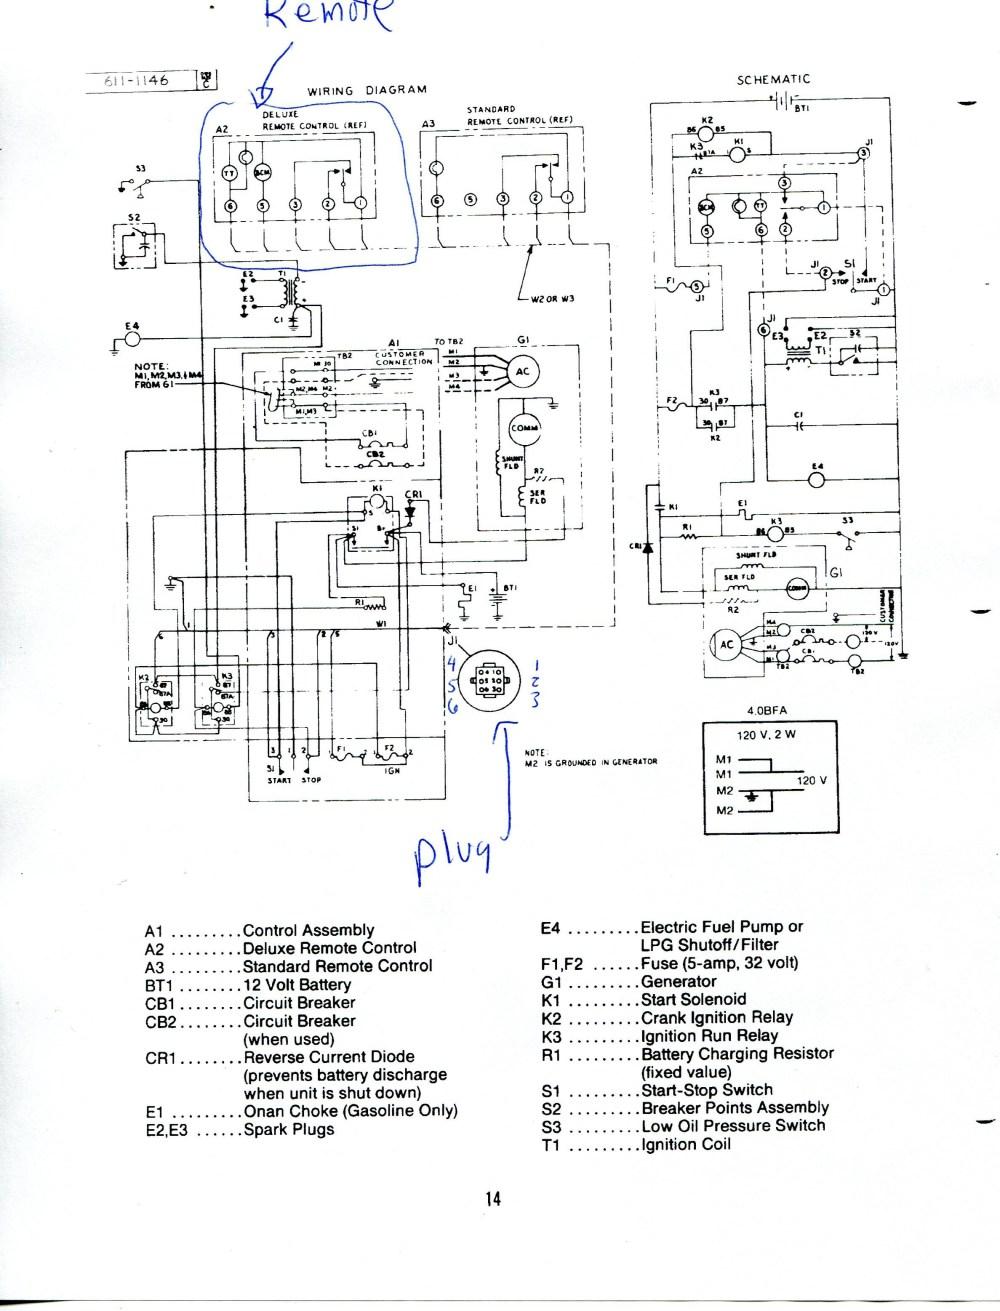 medium resolution of onan generator wiring diagram free wiring diagram rh ricardolevinsmorales com basic electrical wiring breaker box circuit breaker panel wiring diagram